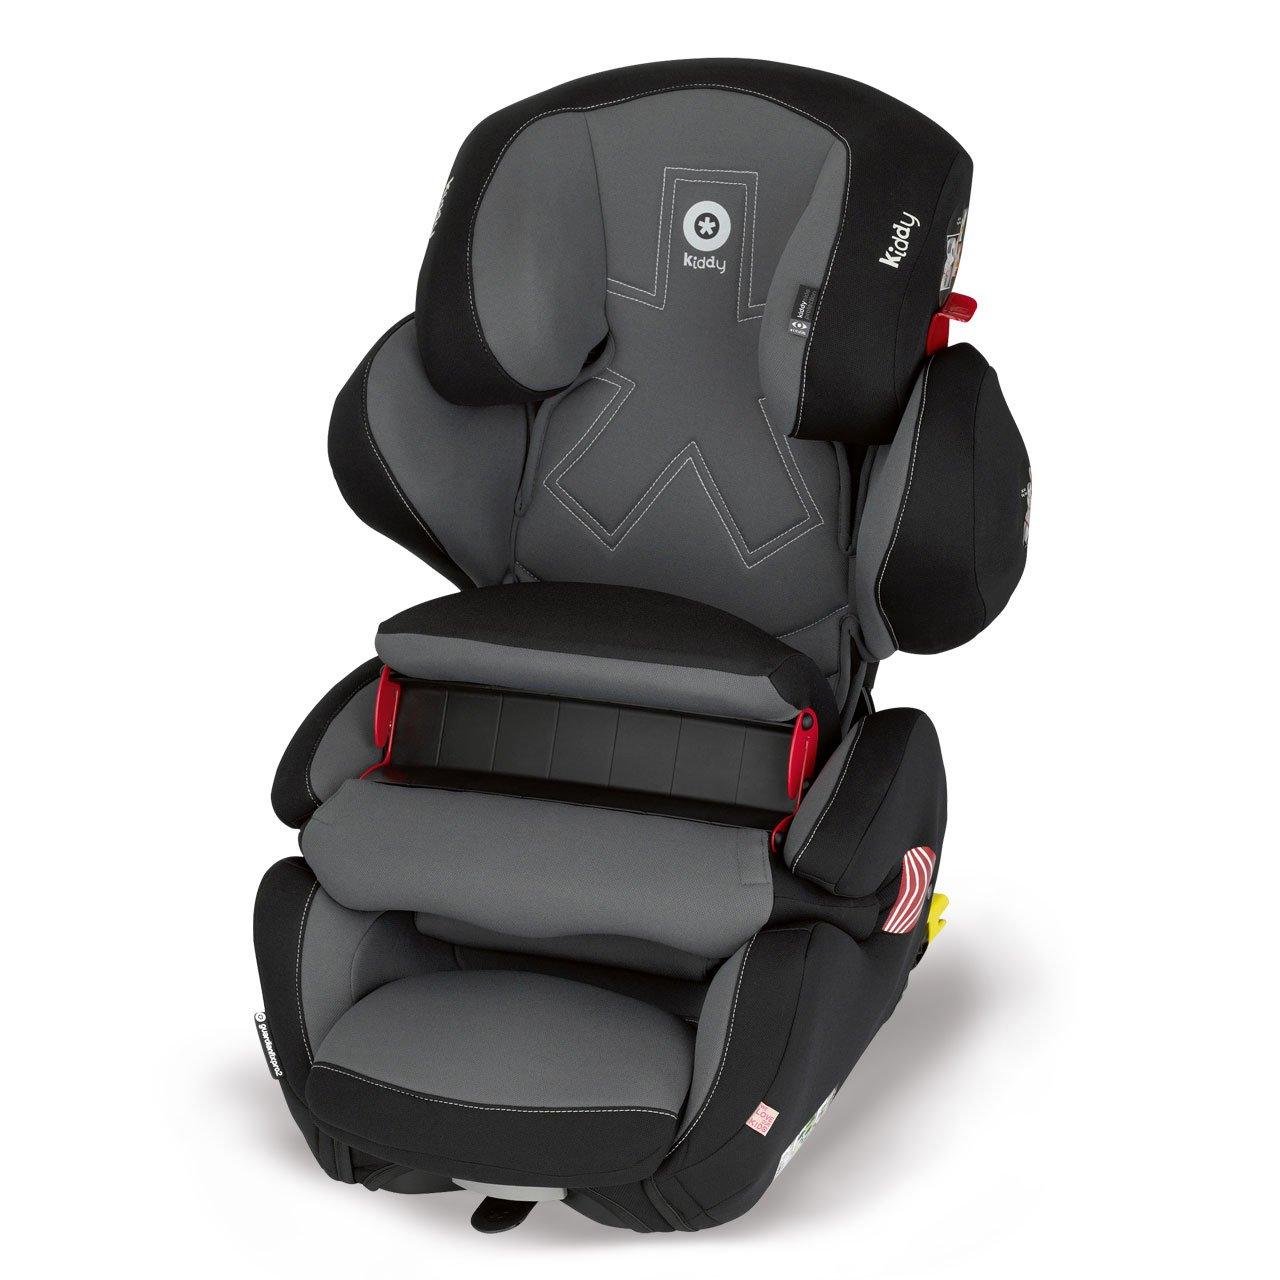 Kiddy 41551GF069 Guardianfix Pro 2 Autositz, Fangkörpersystem, ISOFIX, Gruppe 1/2/3 (9-36 kg, ca. 9 Monate-ca. 12 Jahre), Manhattan (schwarz) Fangkörpersystem